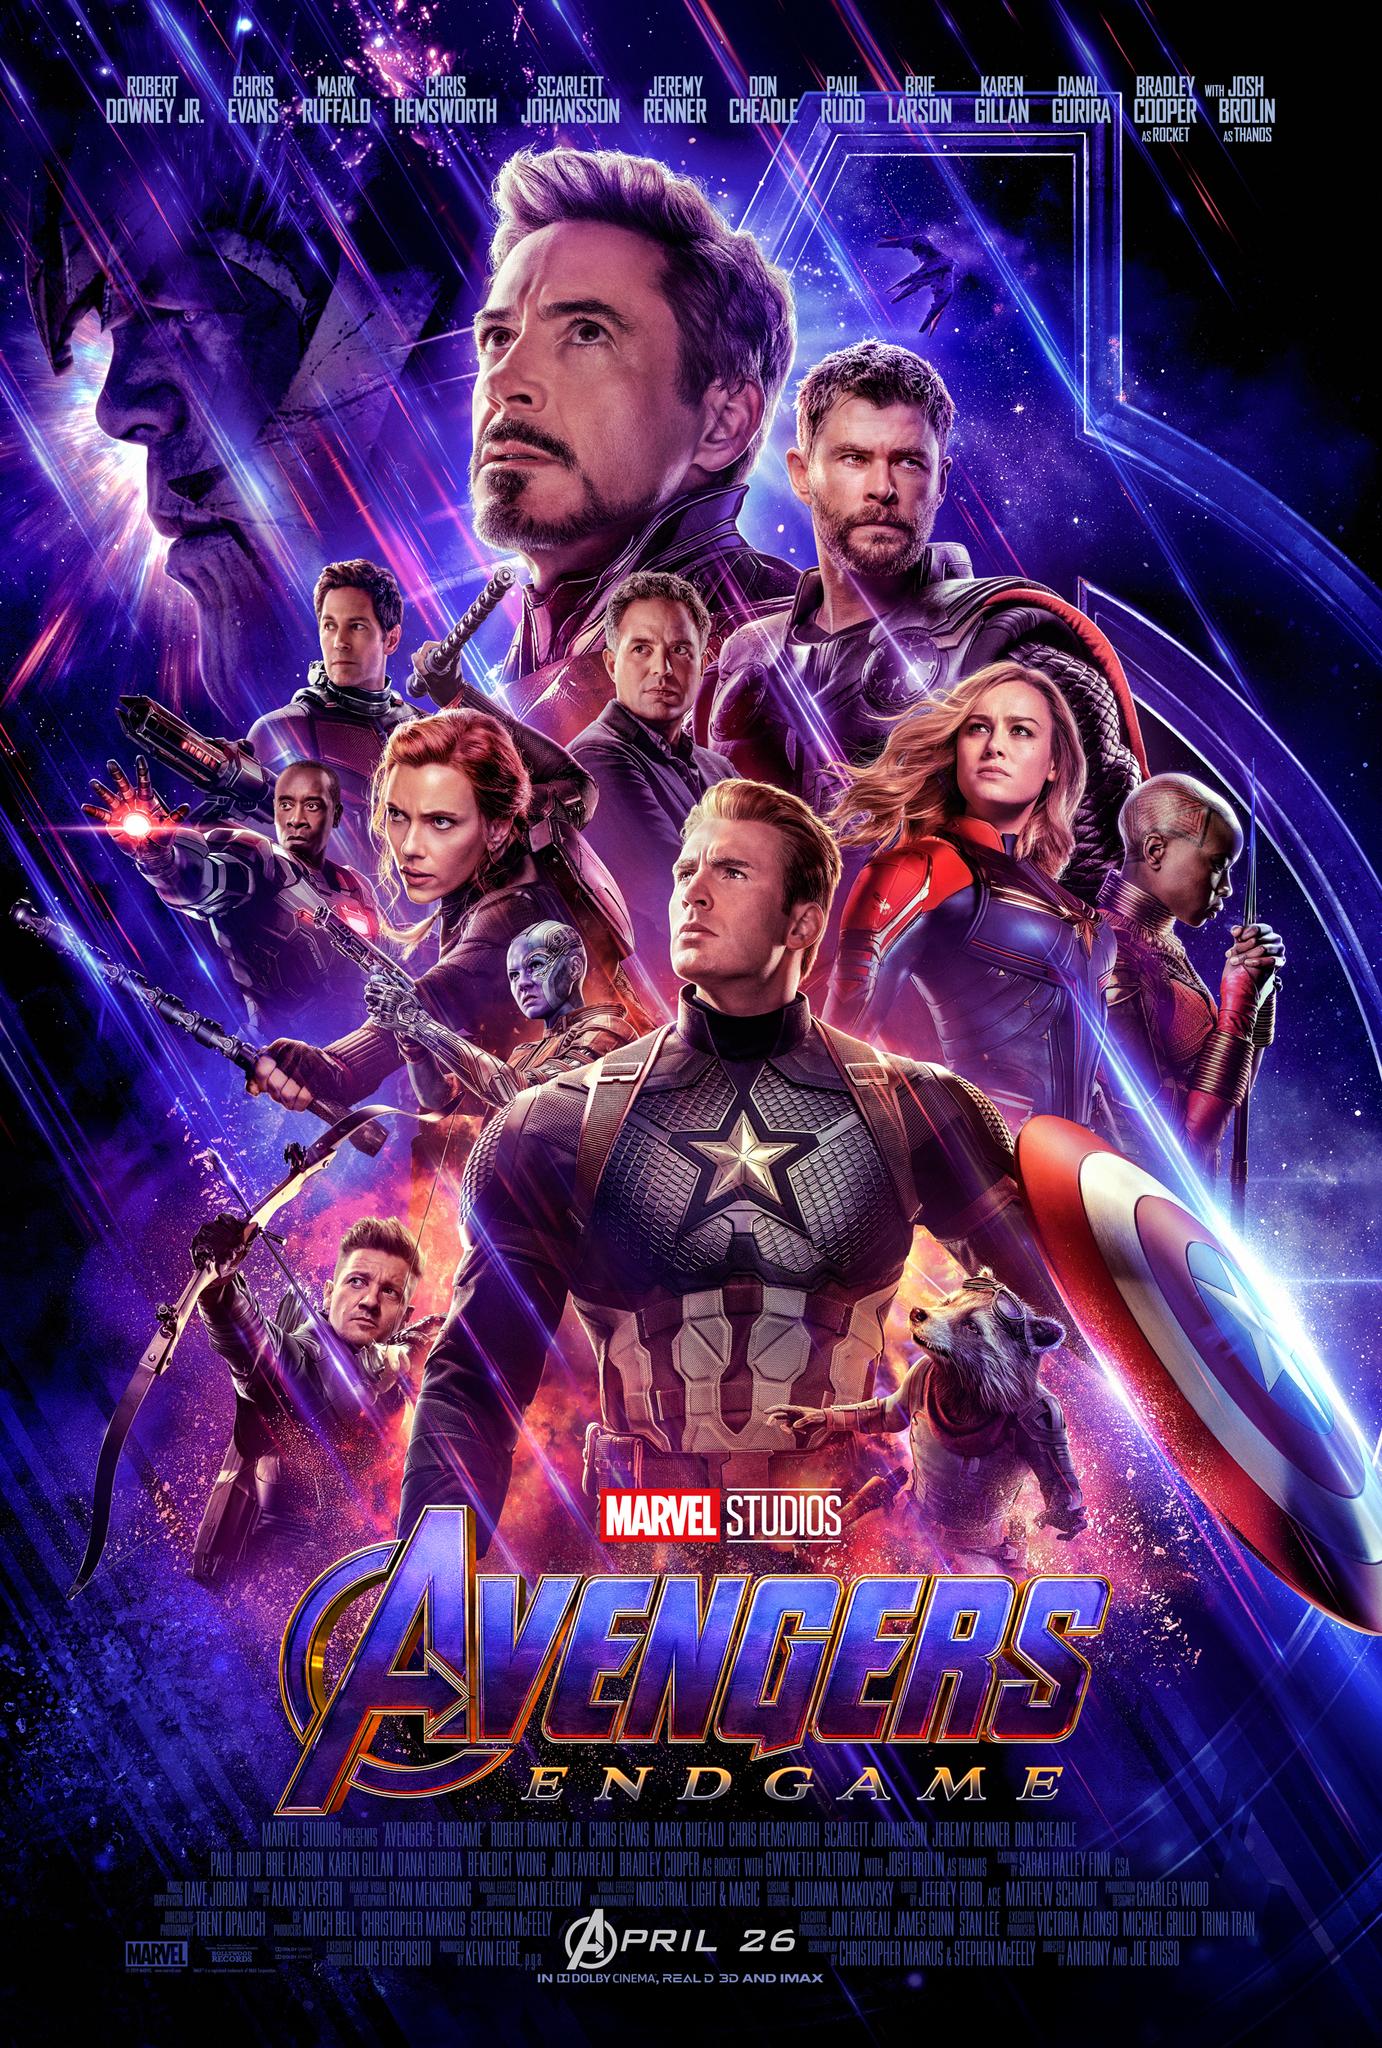 Avengers Endgame (2019) Hindi Dual Audio 720p